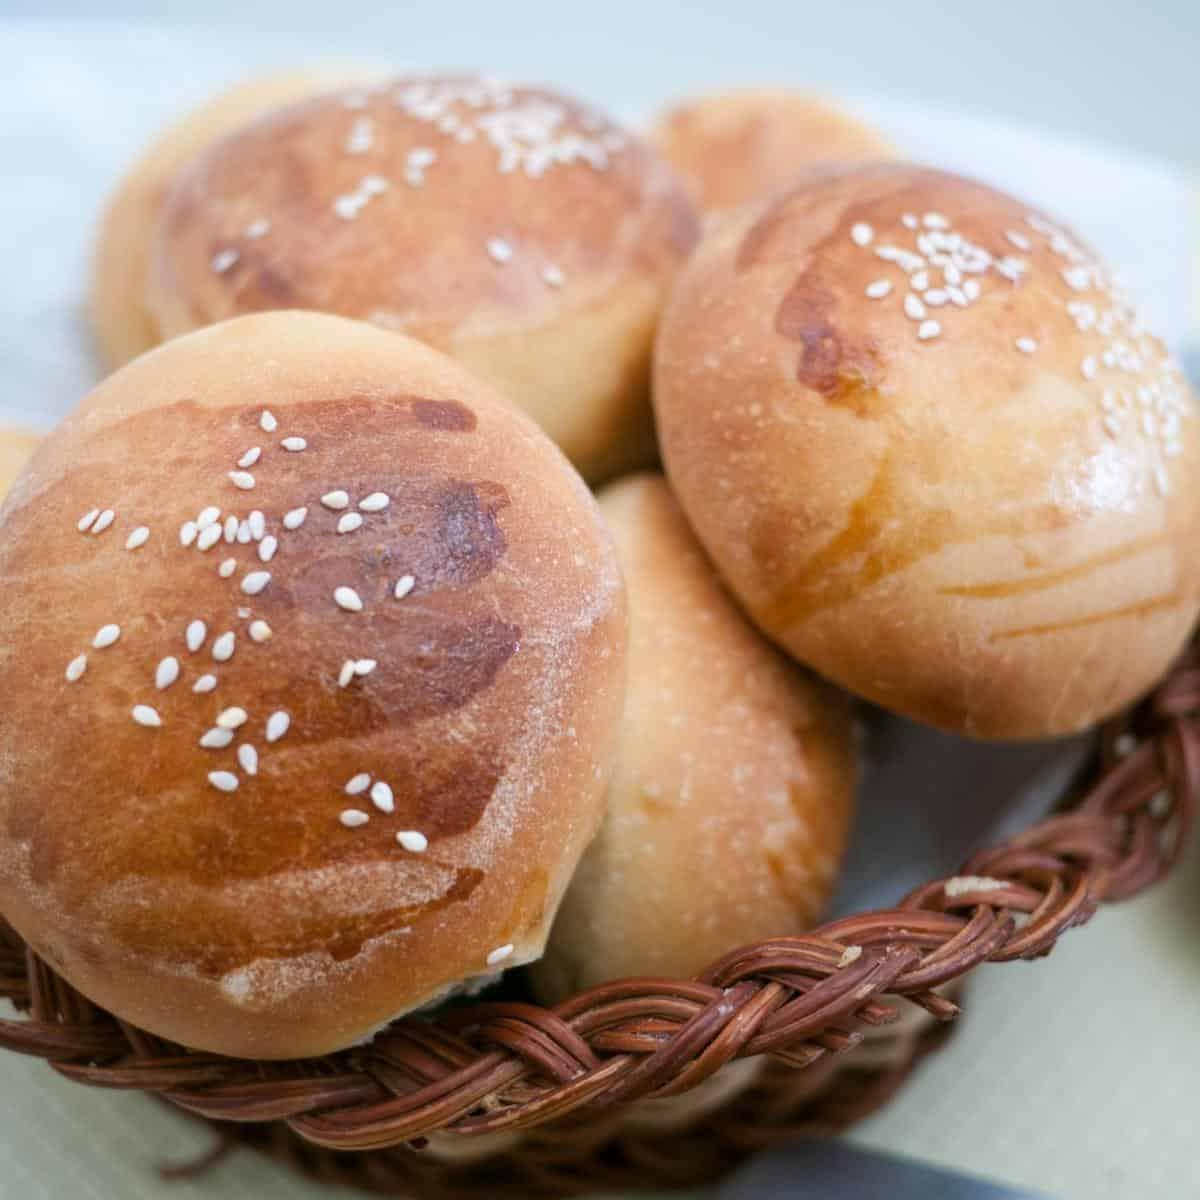 A basket with hamburger buns.